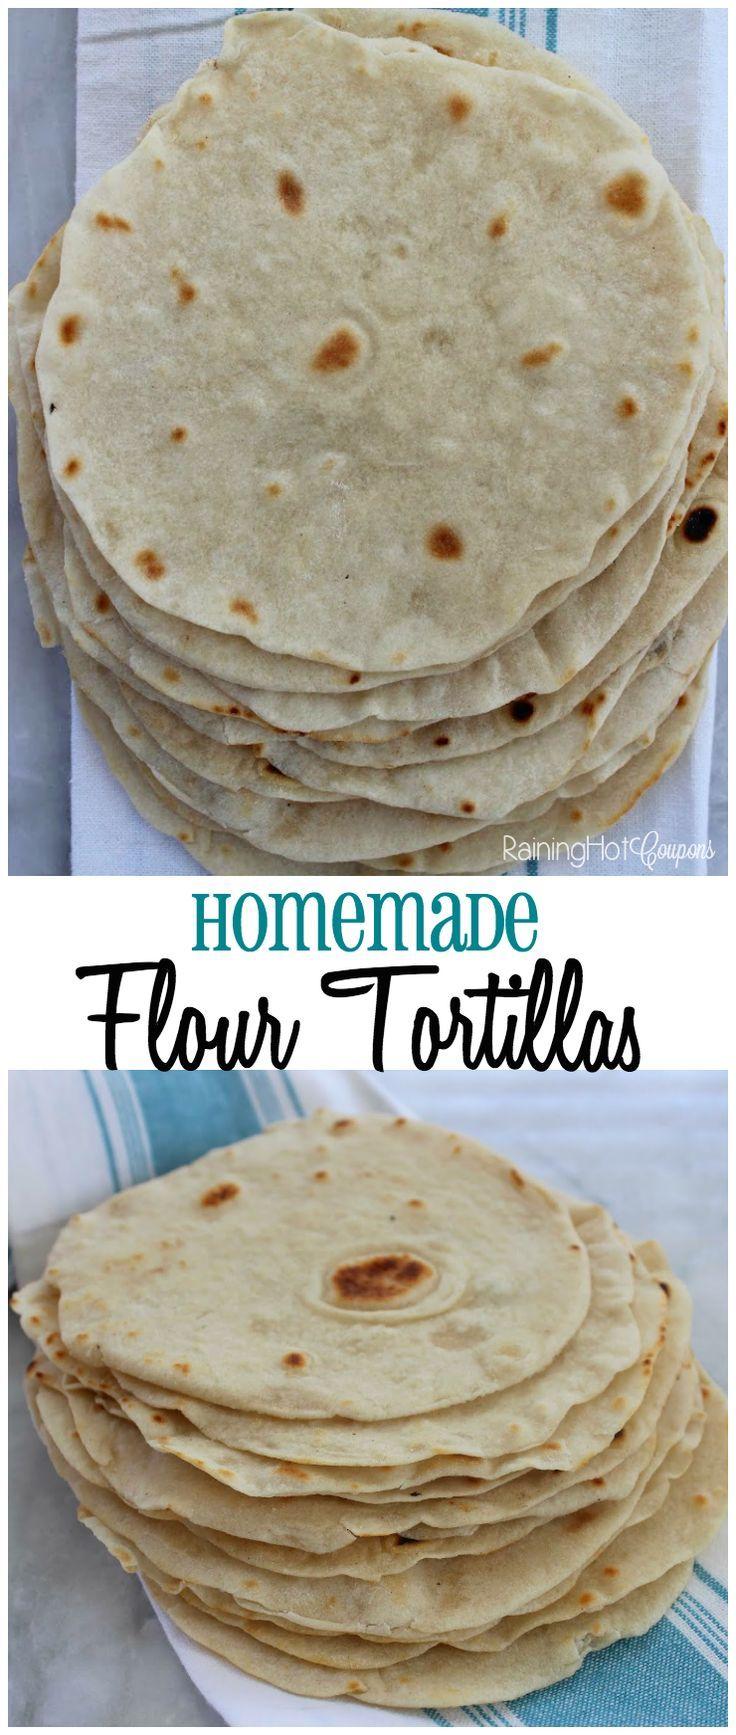 Homemade Flour Tortillas - Raining Hot Coupons